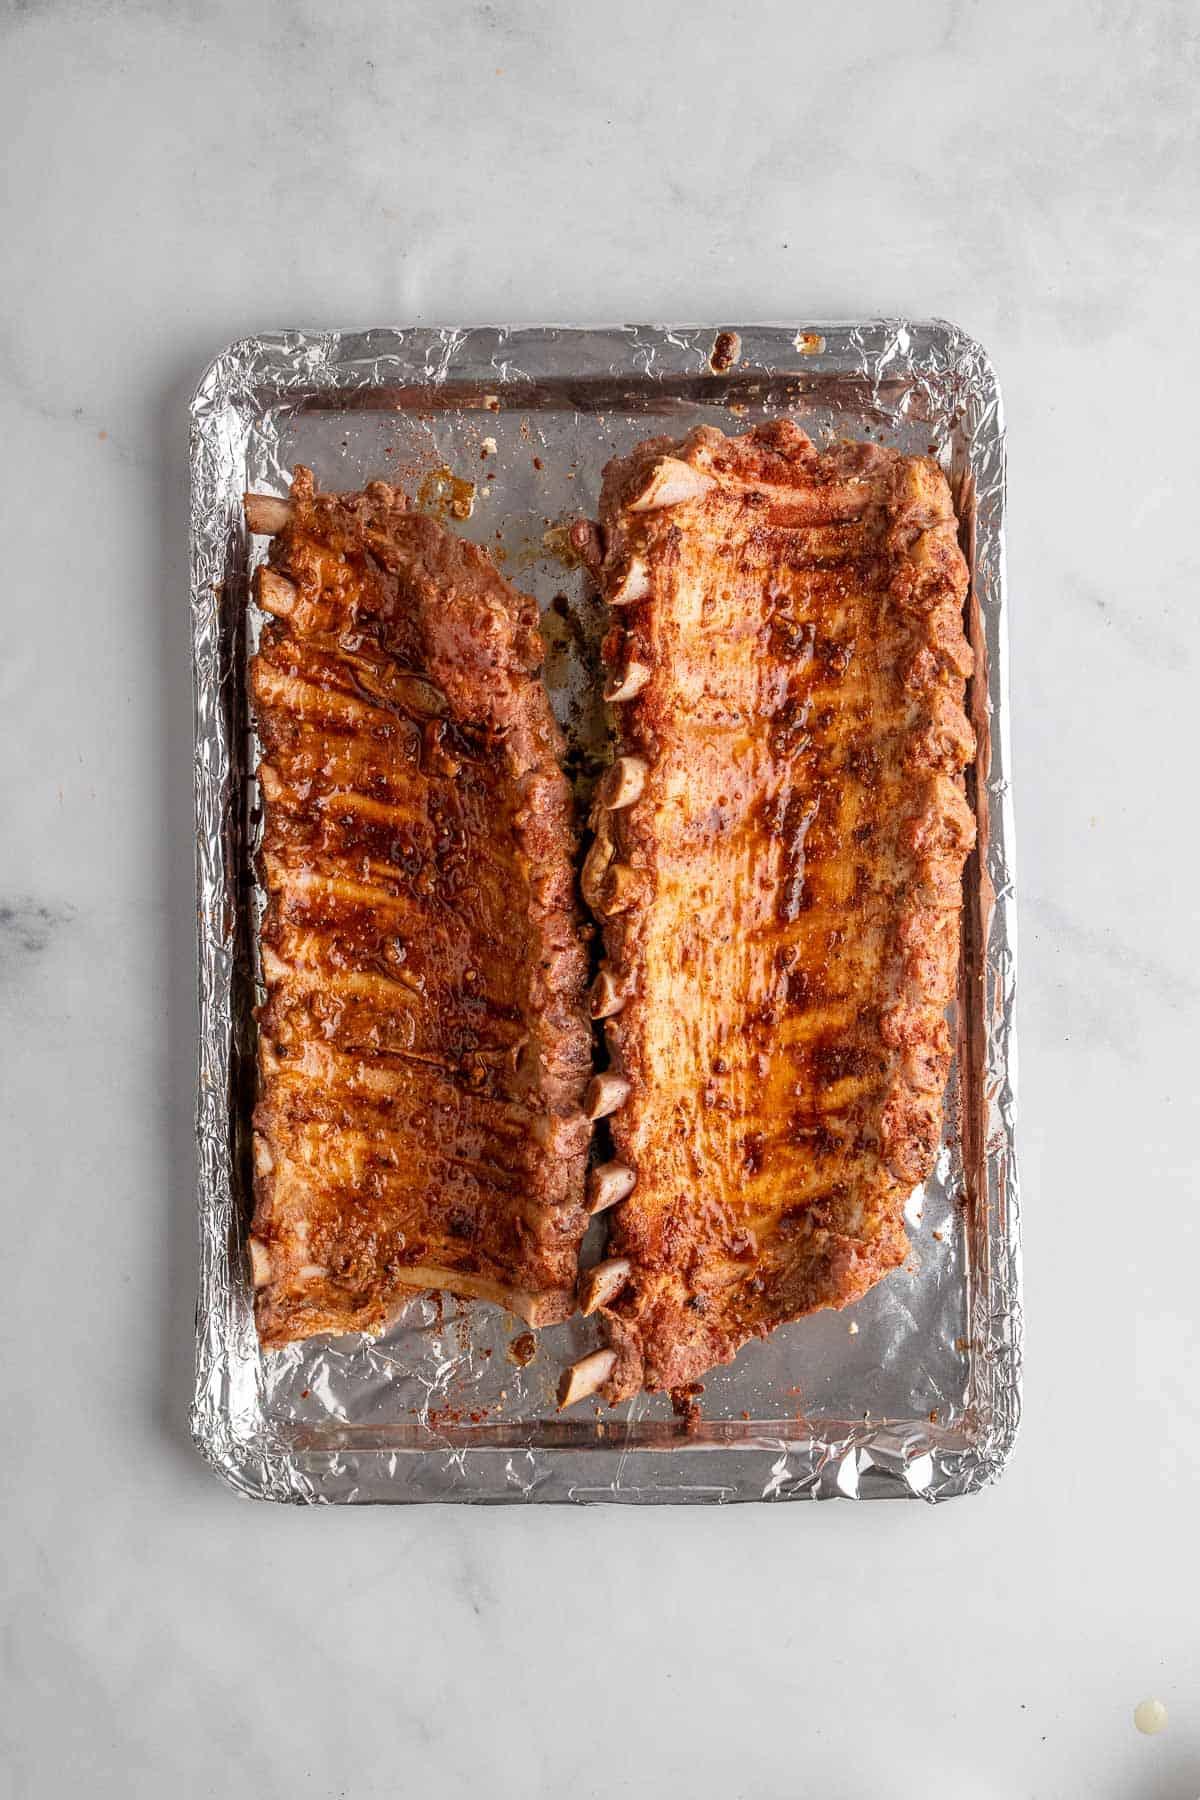 Two racks of ribs upside-down on a baking sheet